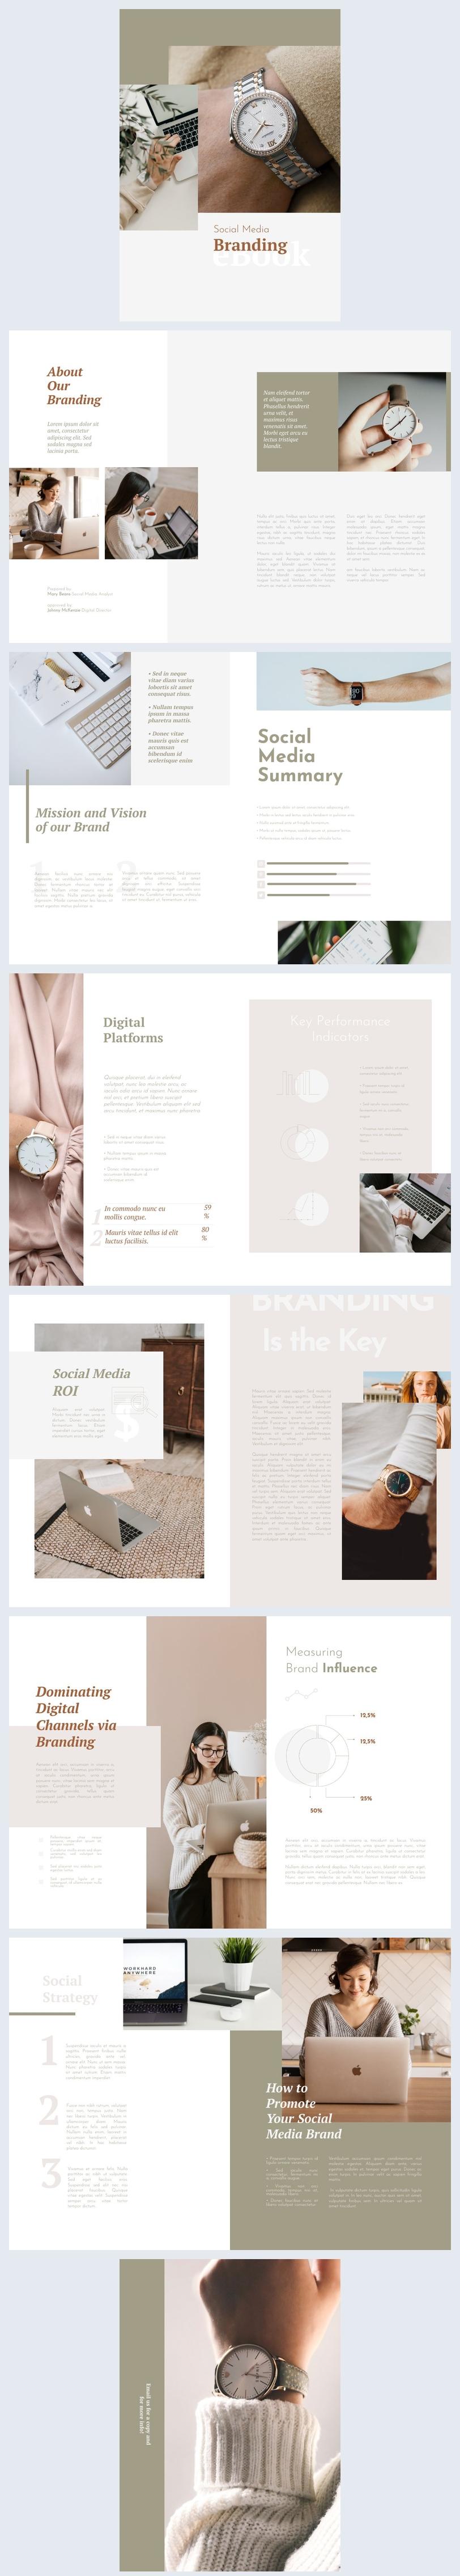 Esempio grafico per eBook di social media branding